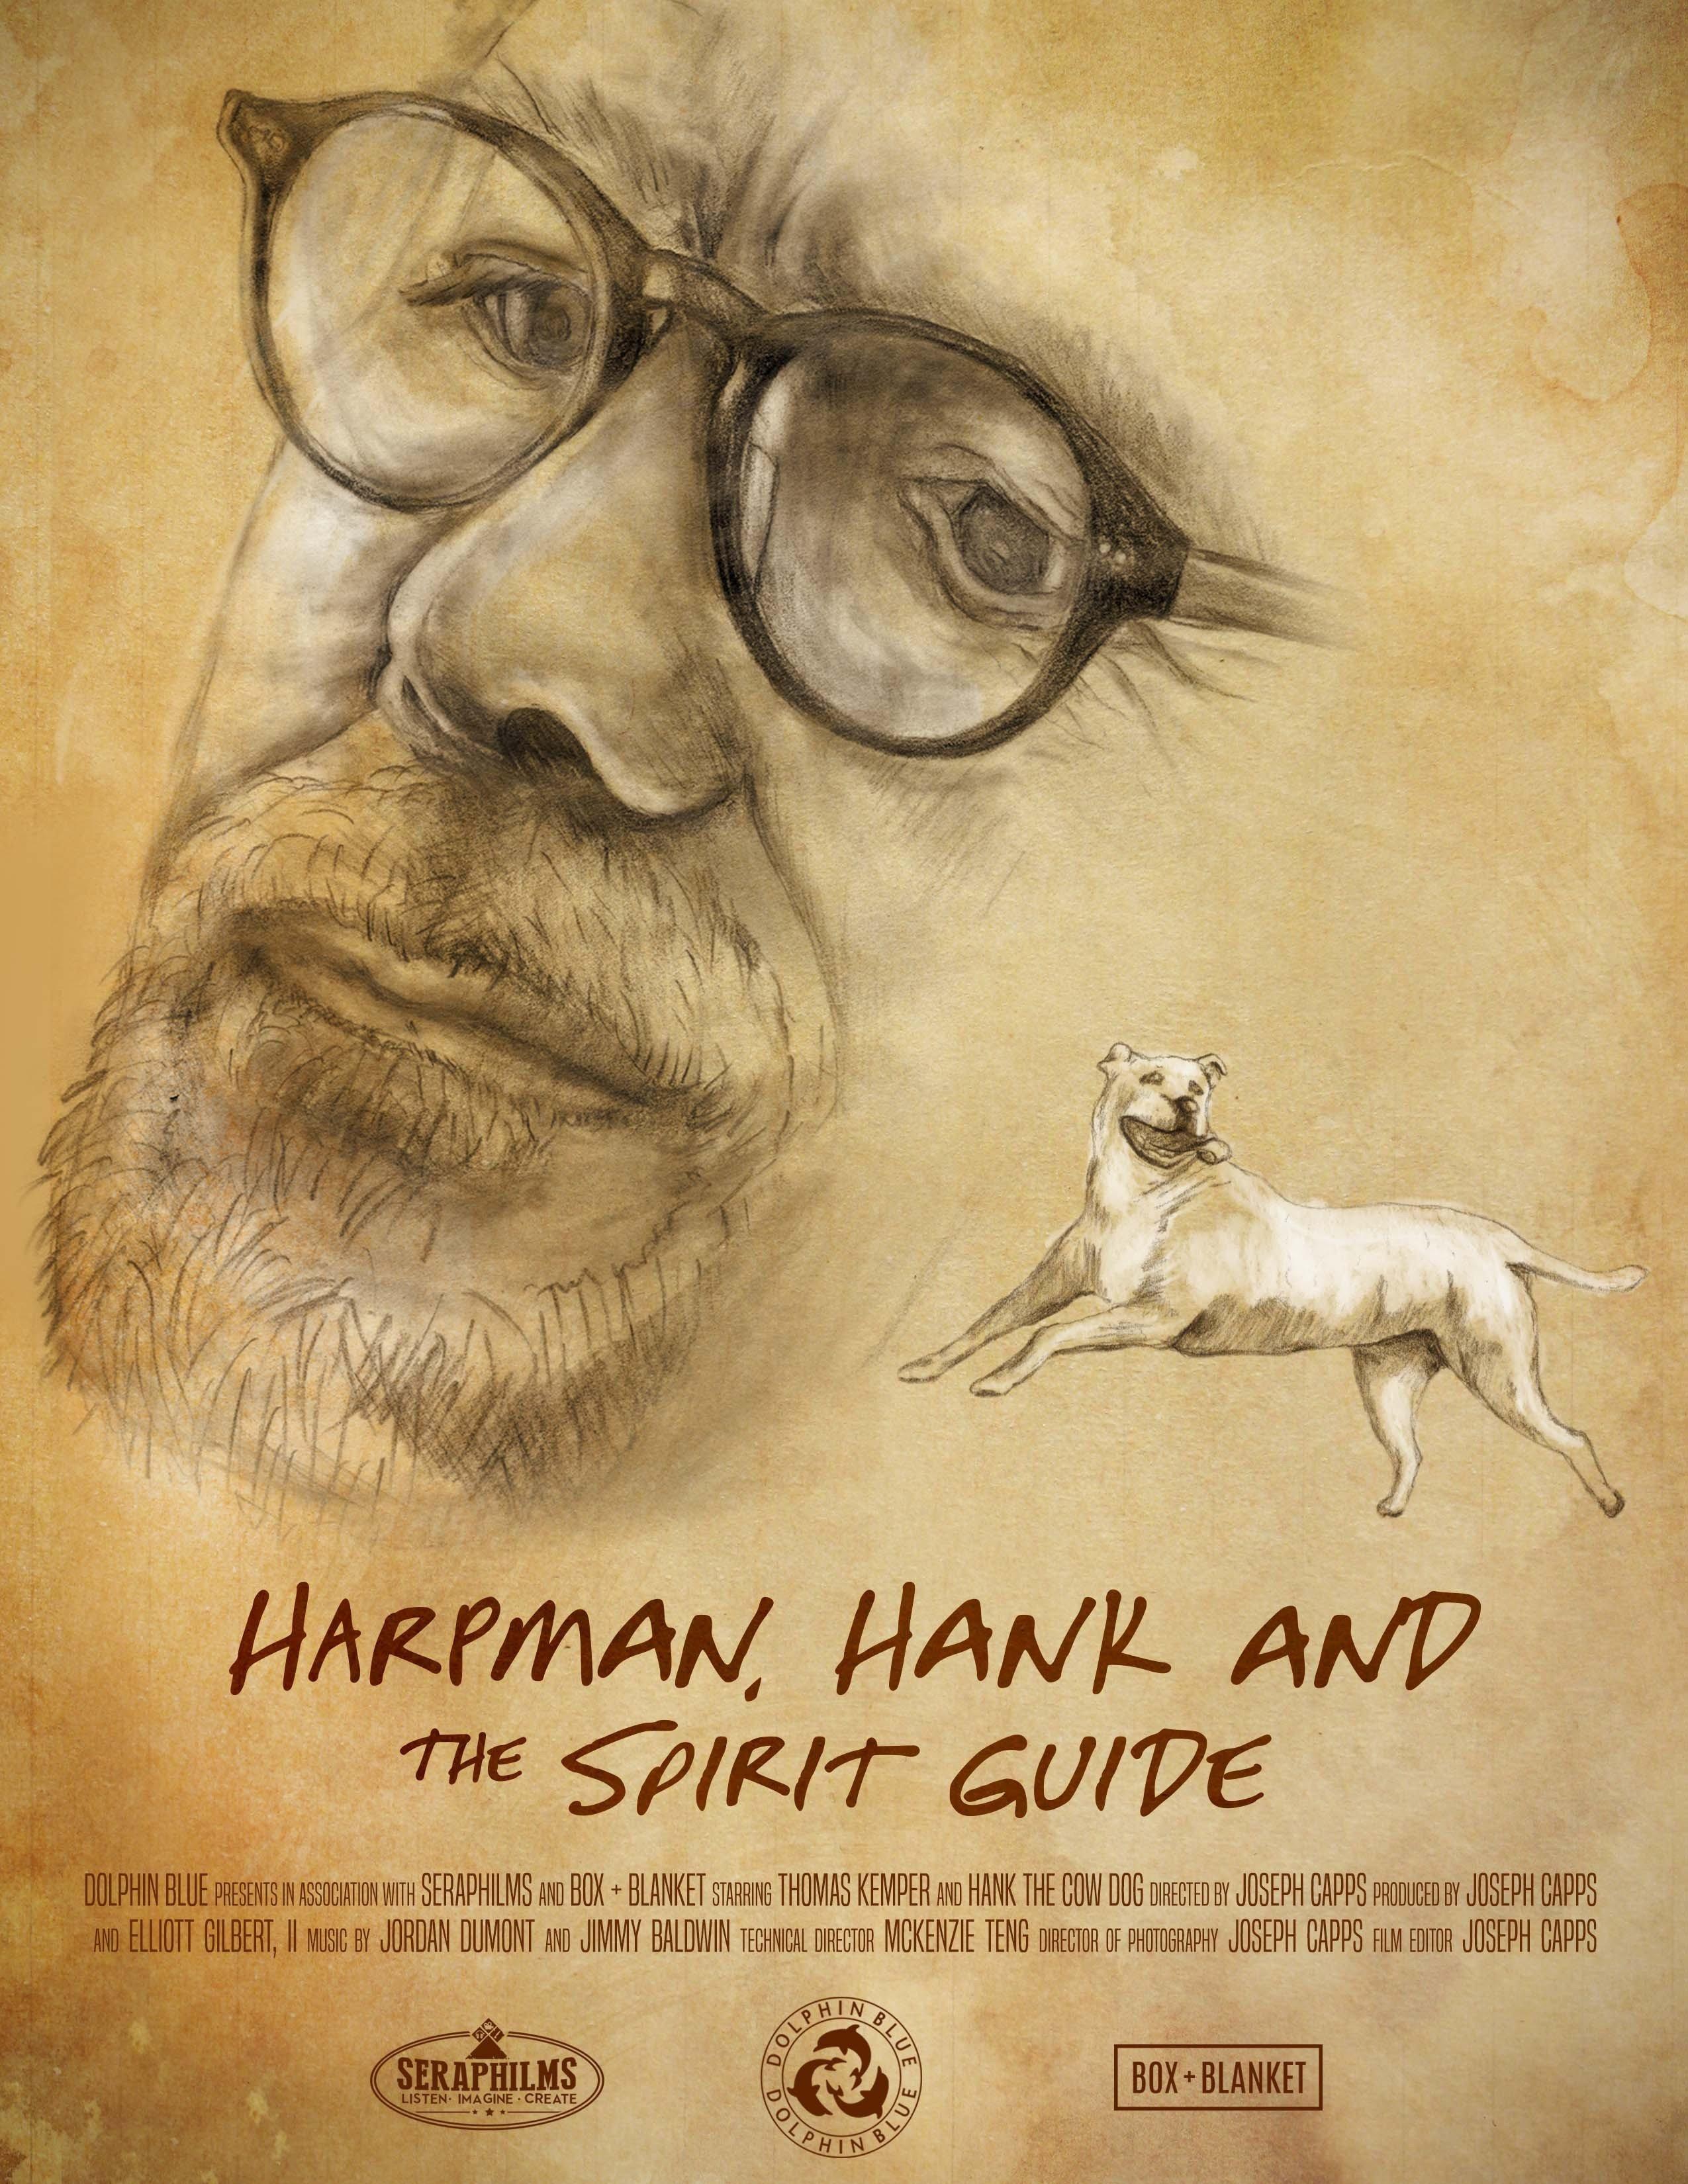 Harpman, Hank and the Spirit Guide (2015) - IMDb